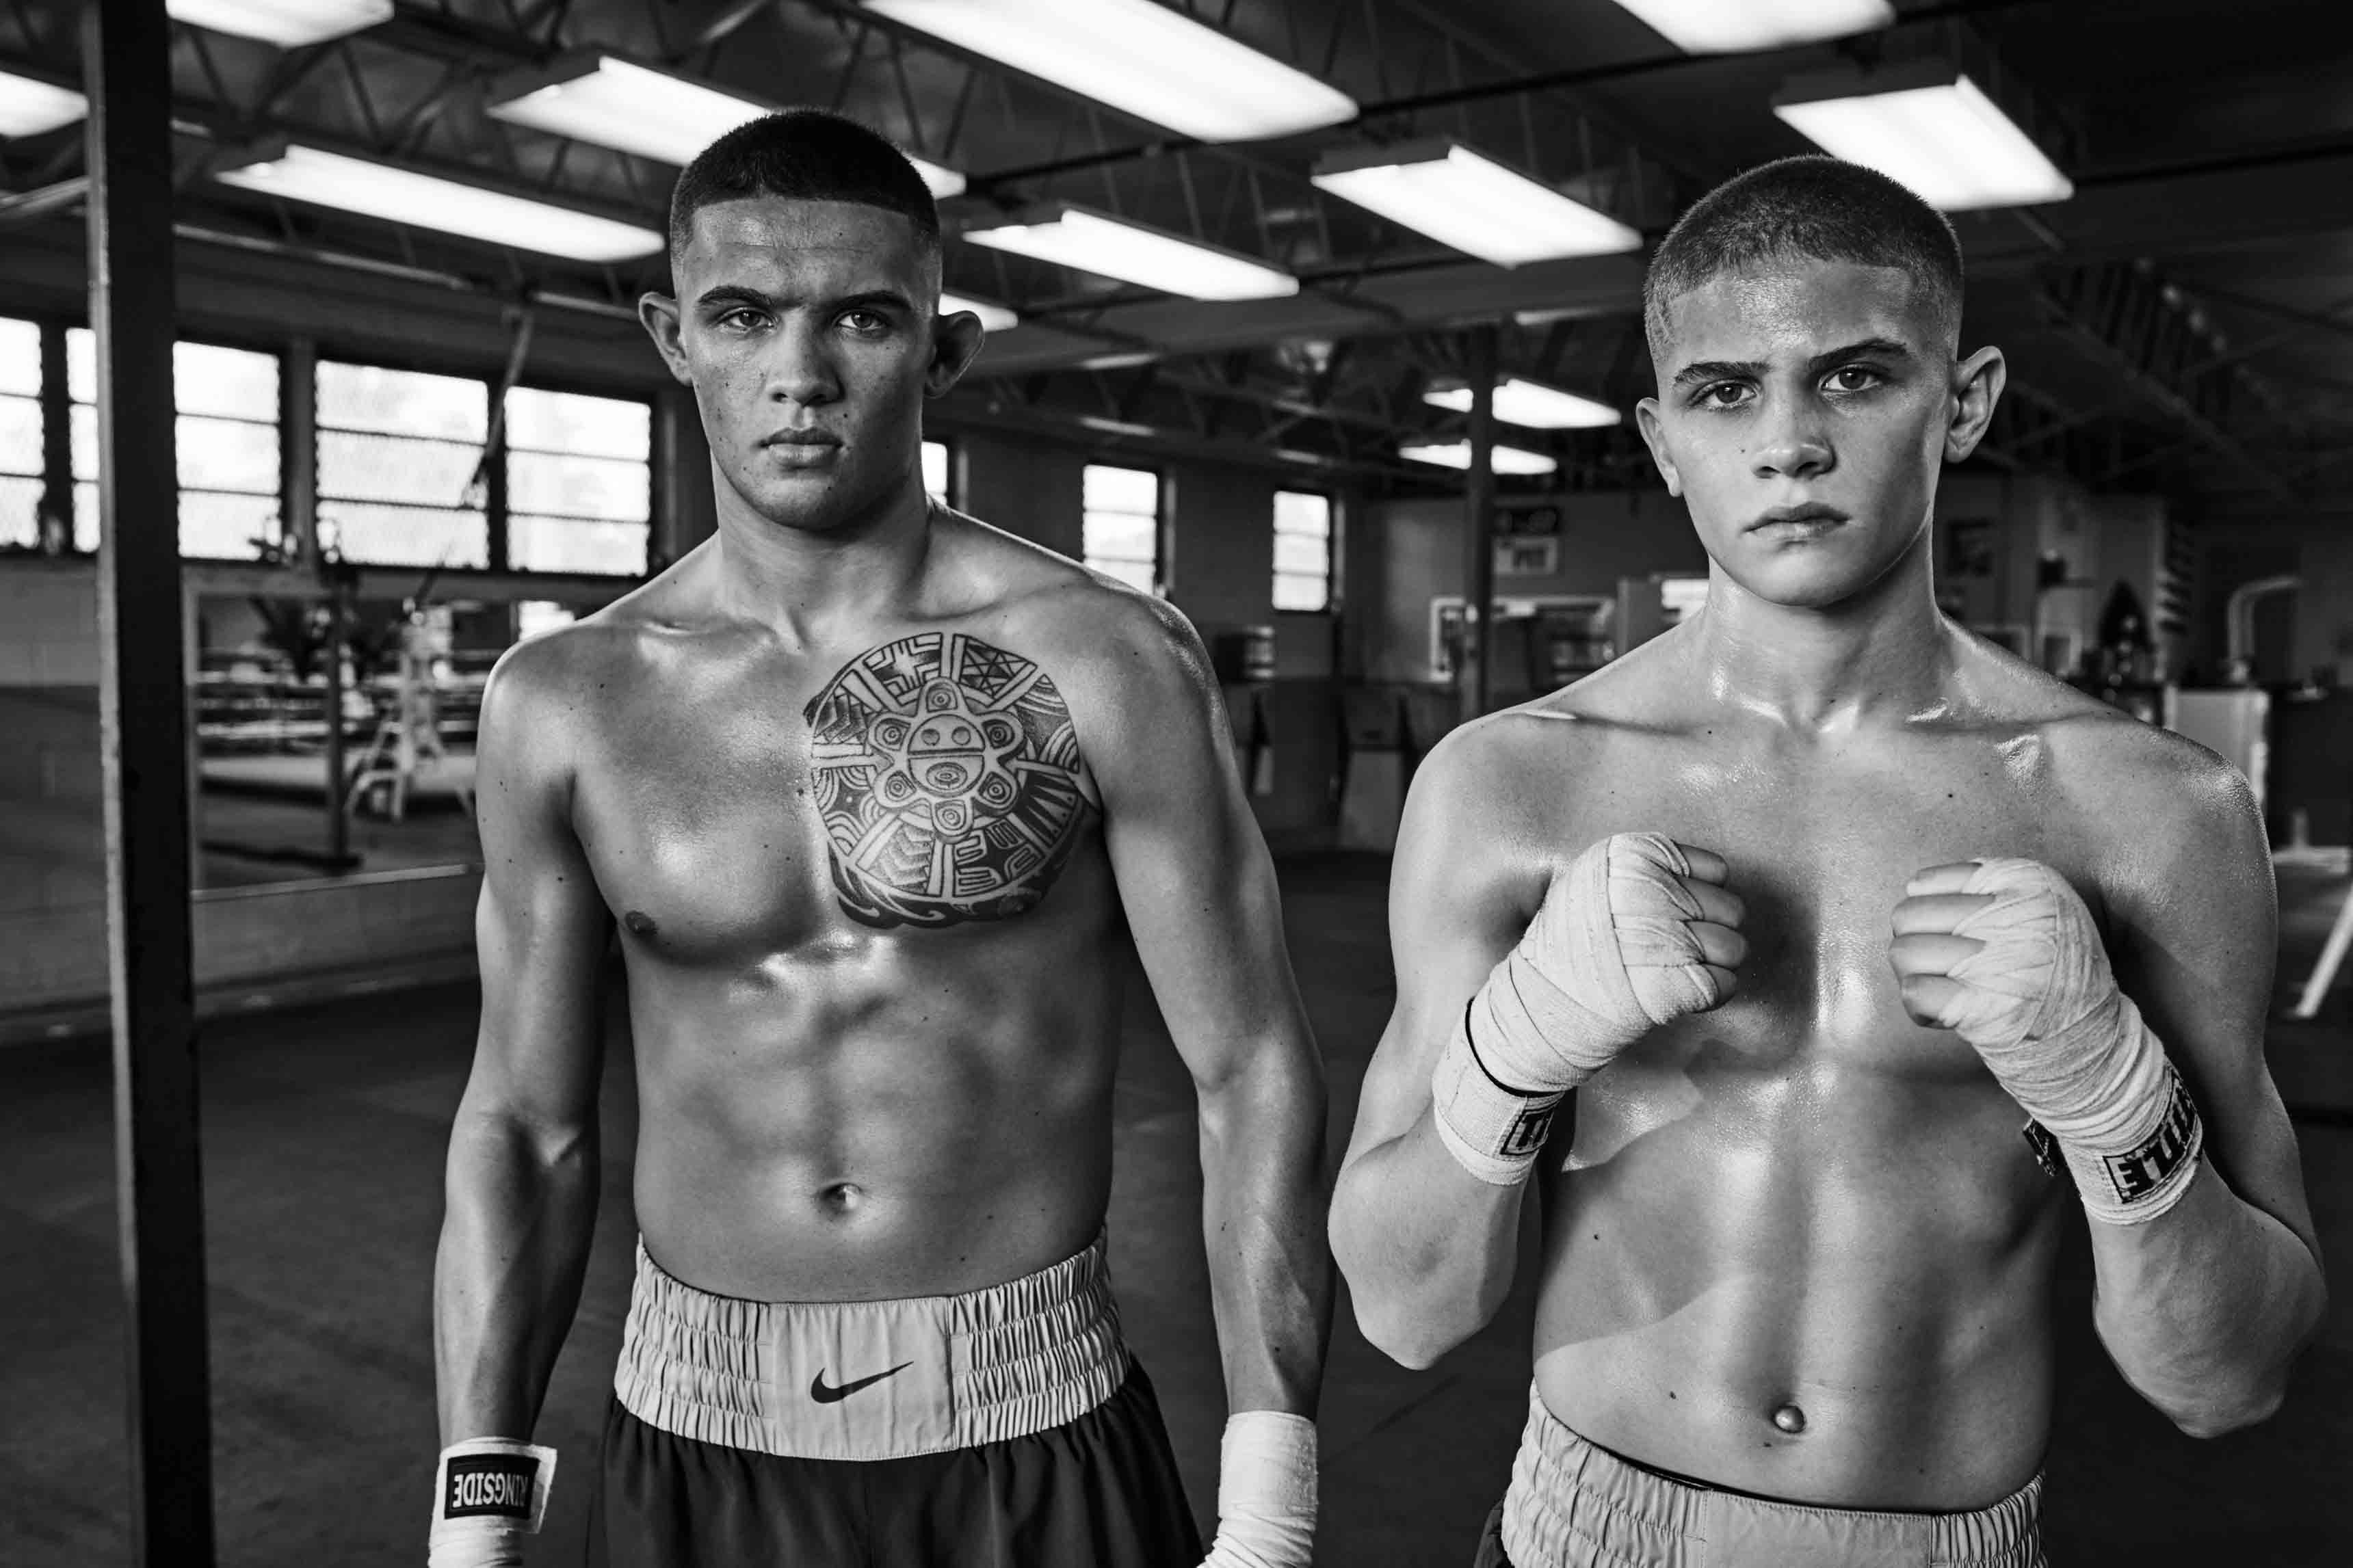 À gauche : short en satin de polyamide, Nike. Bandes de boxe, Ringside. À droite : short en satin de polyamide, Nike. Bandes de boxe, Title Boxing.